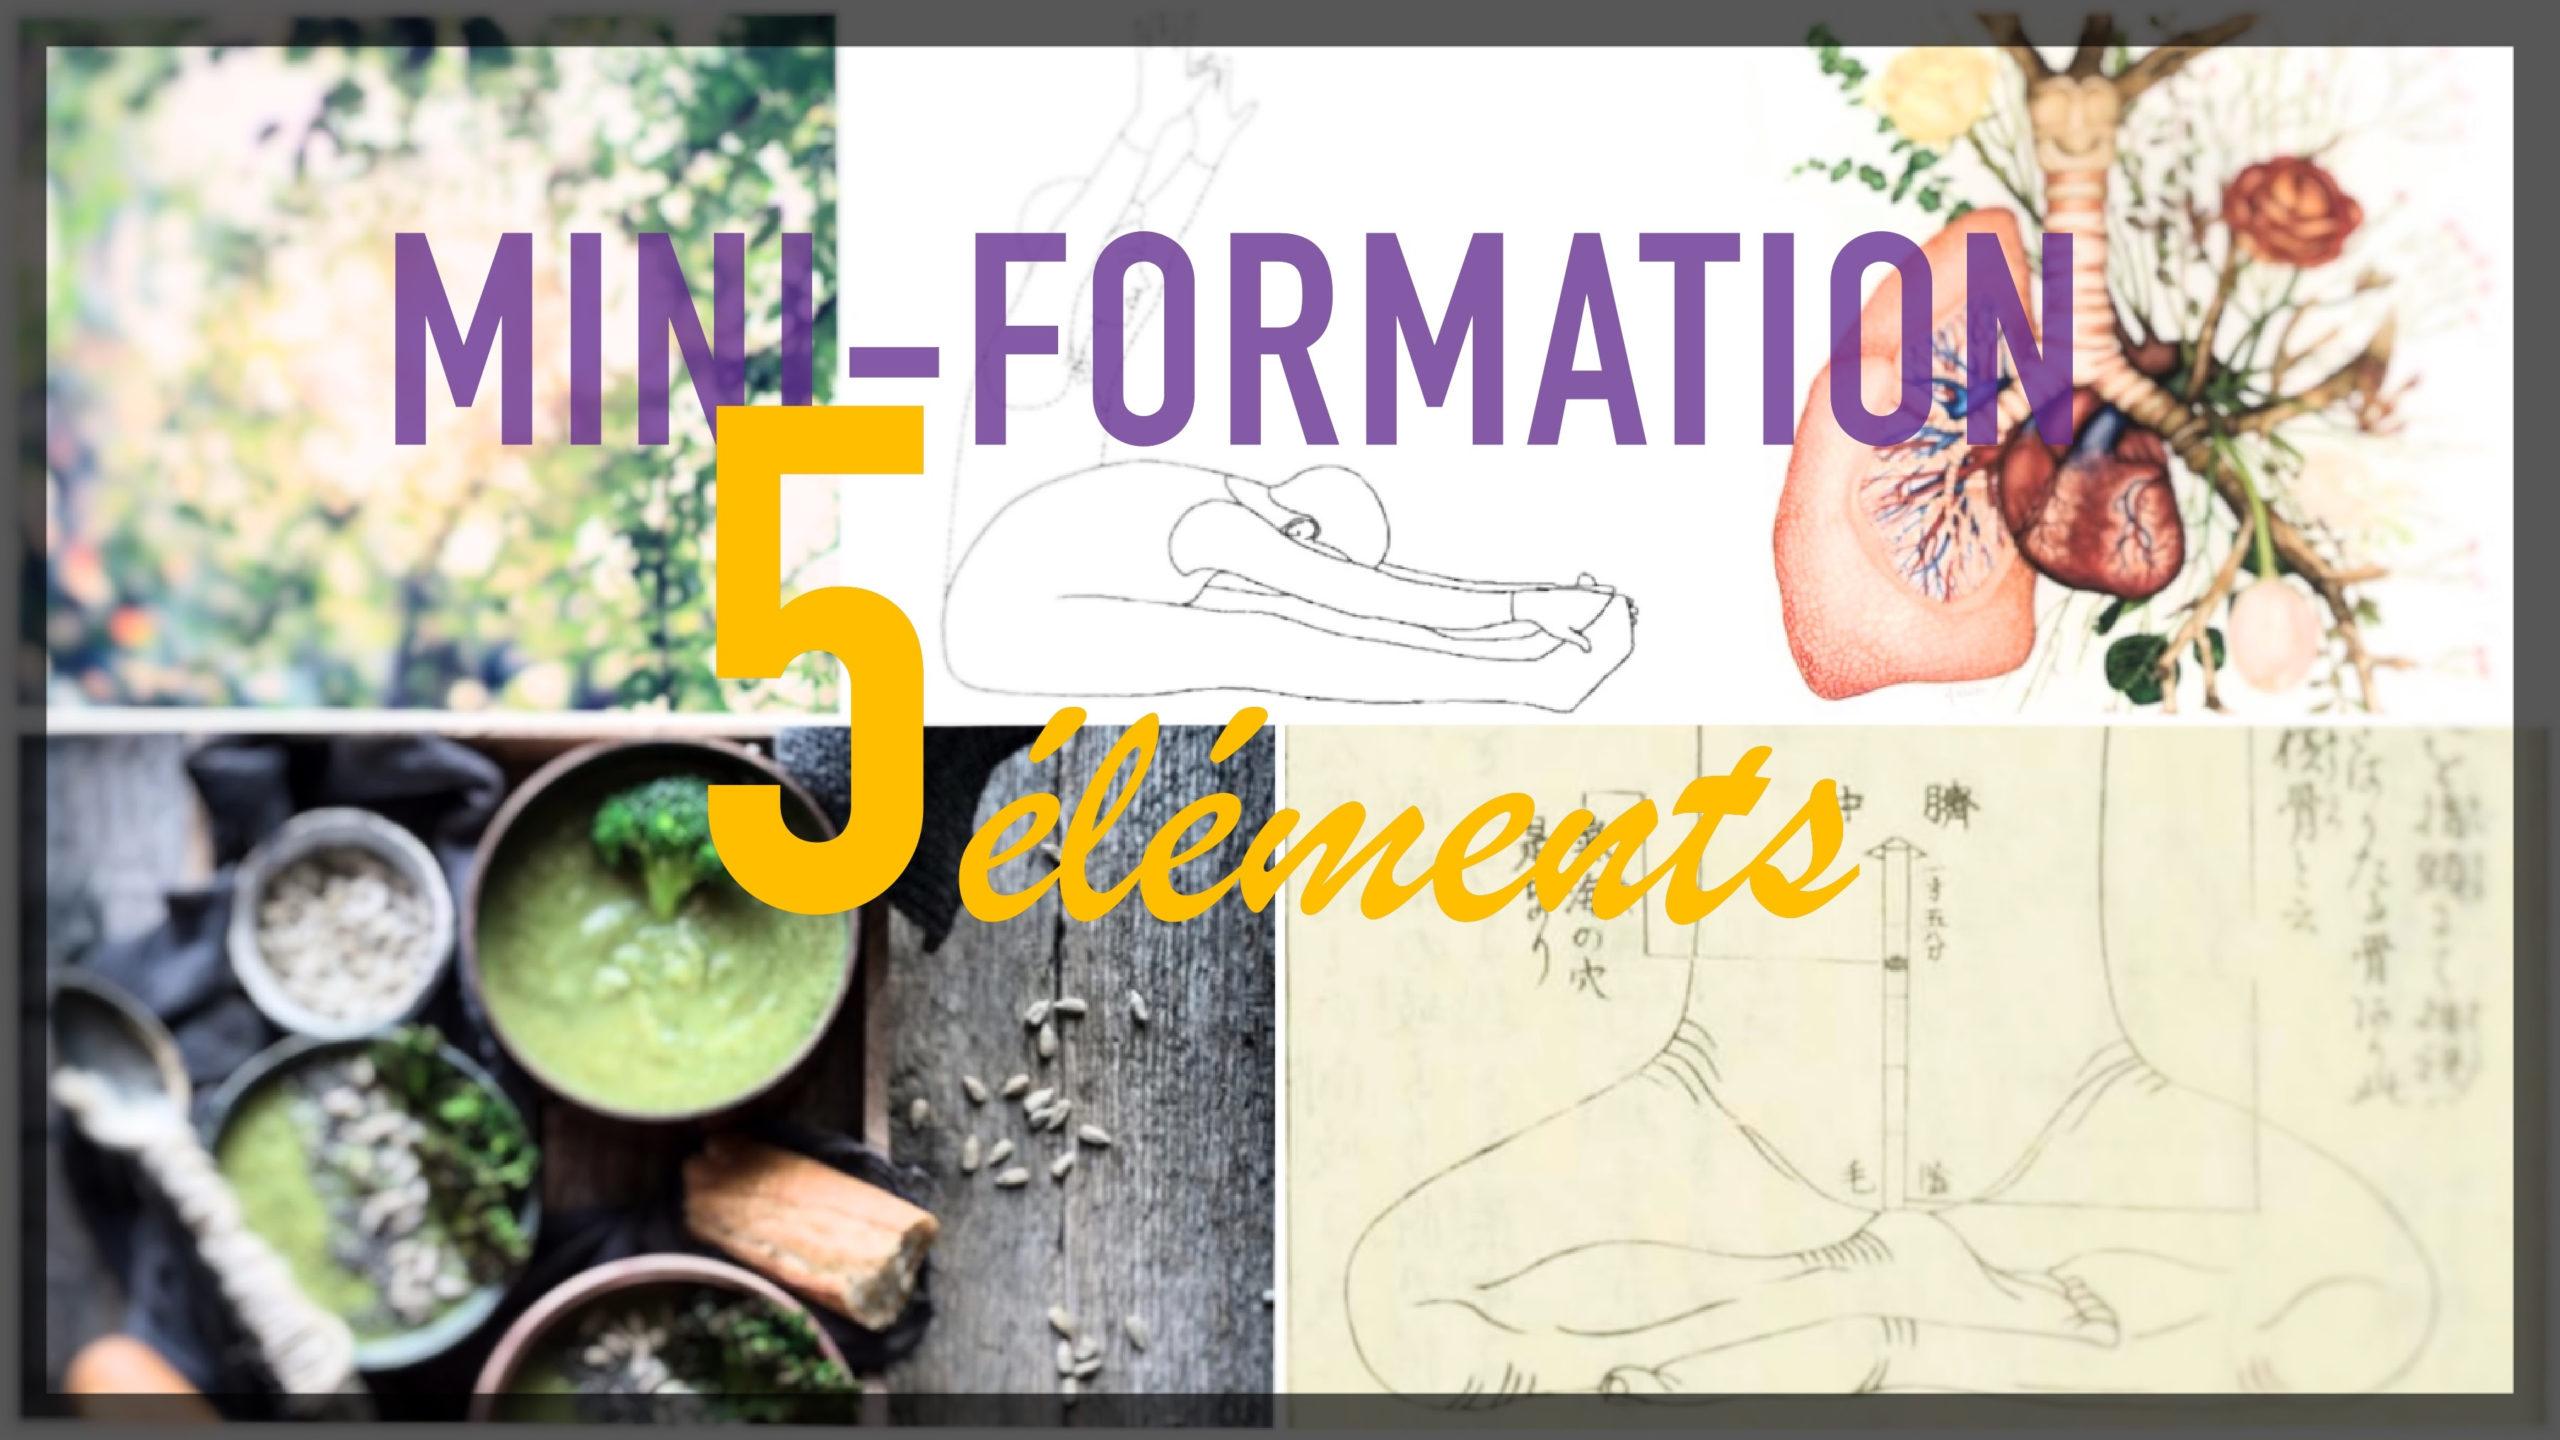 Mini-formation 5 éléments